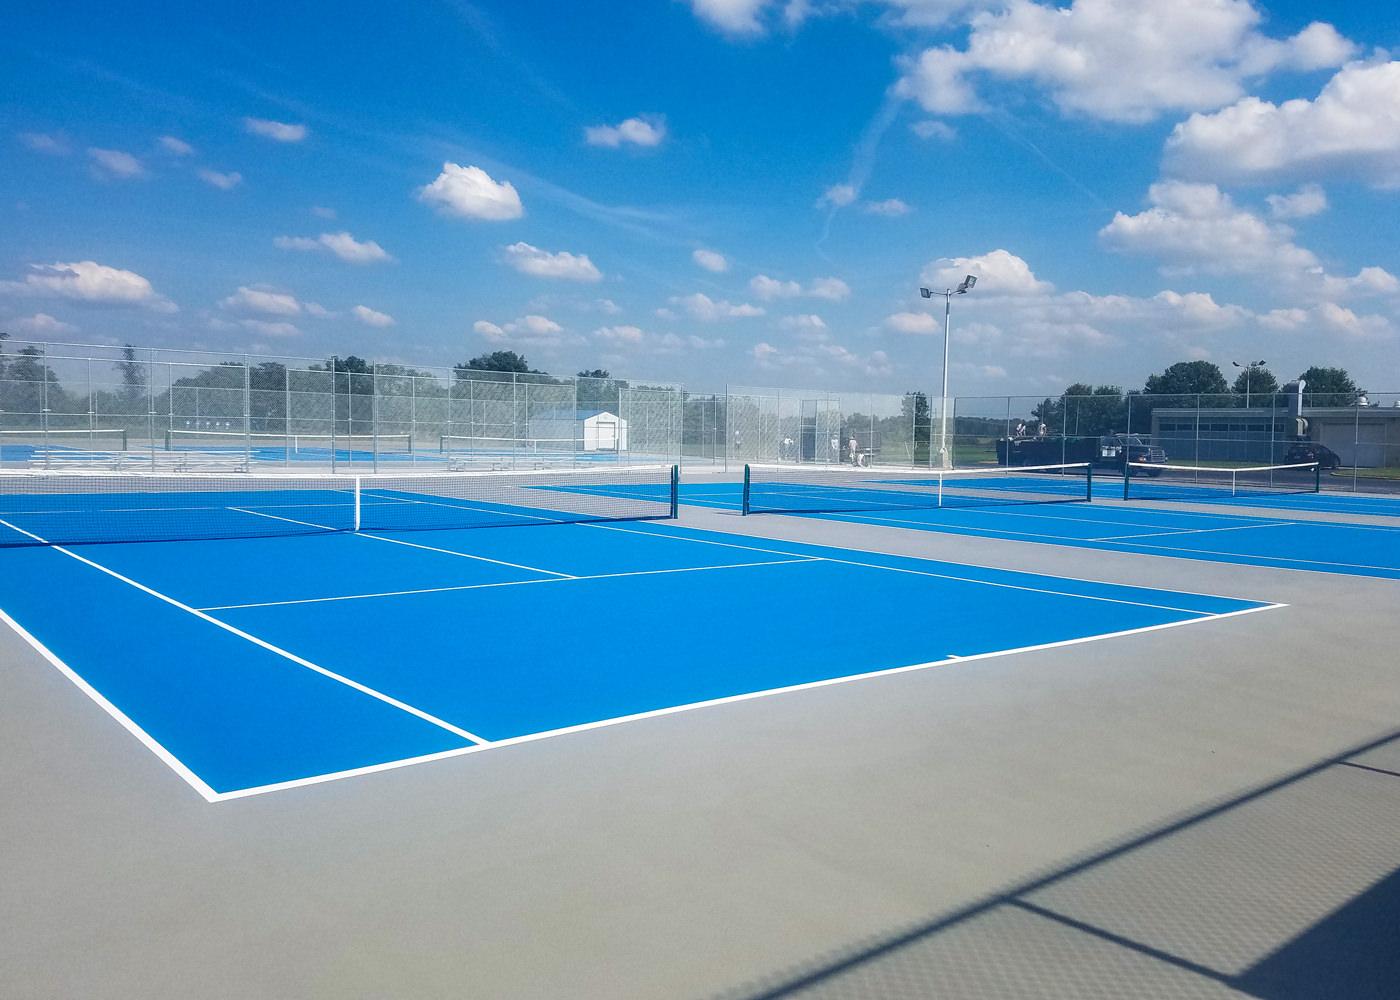 Blue-Grey-Tennis-Img.jpg